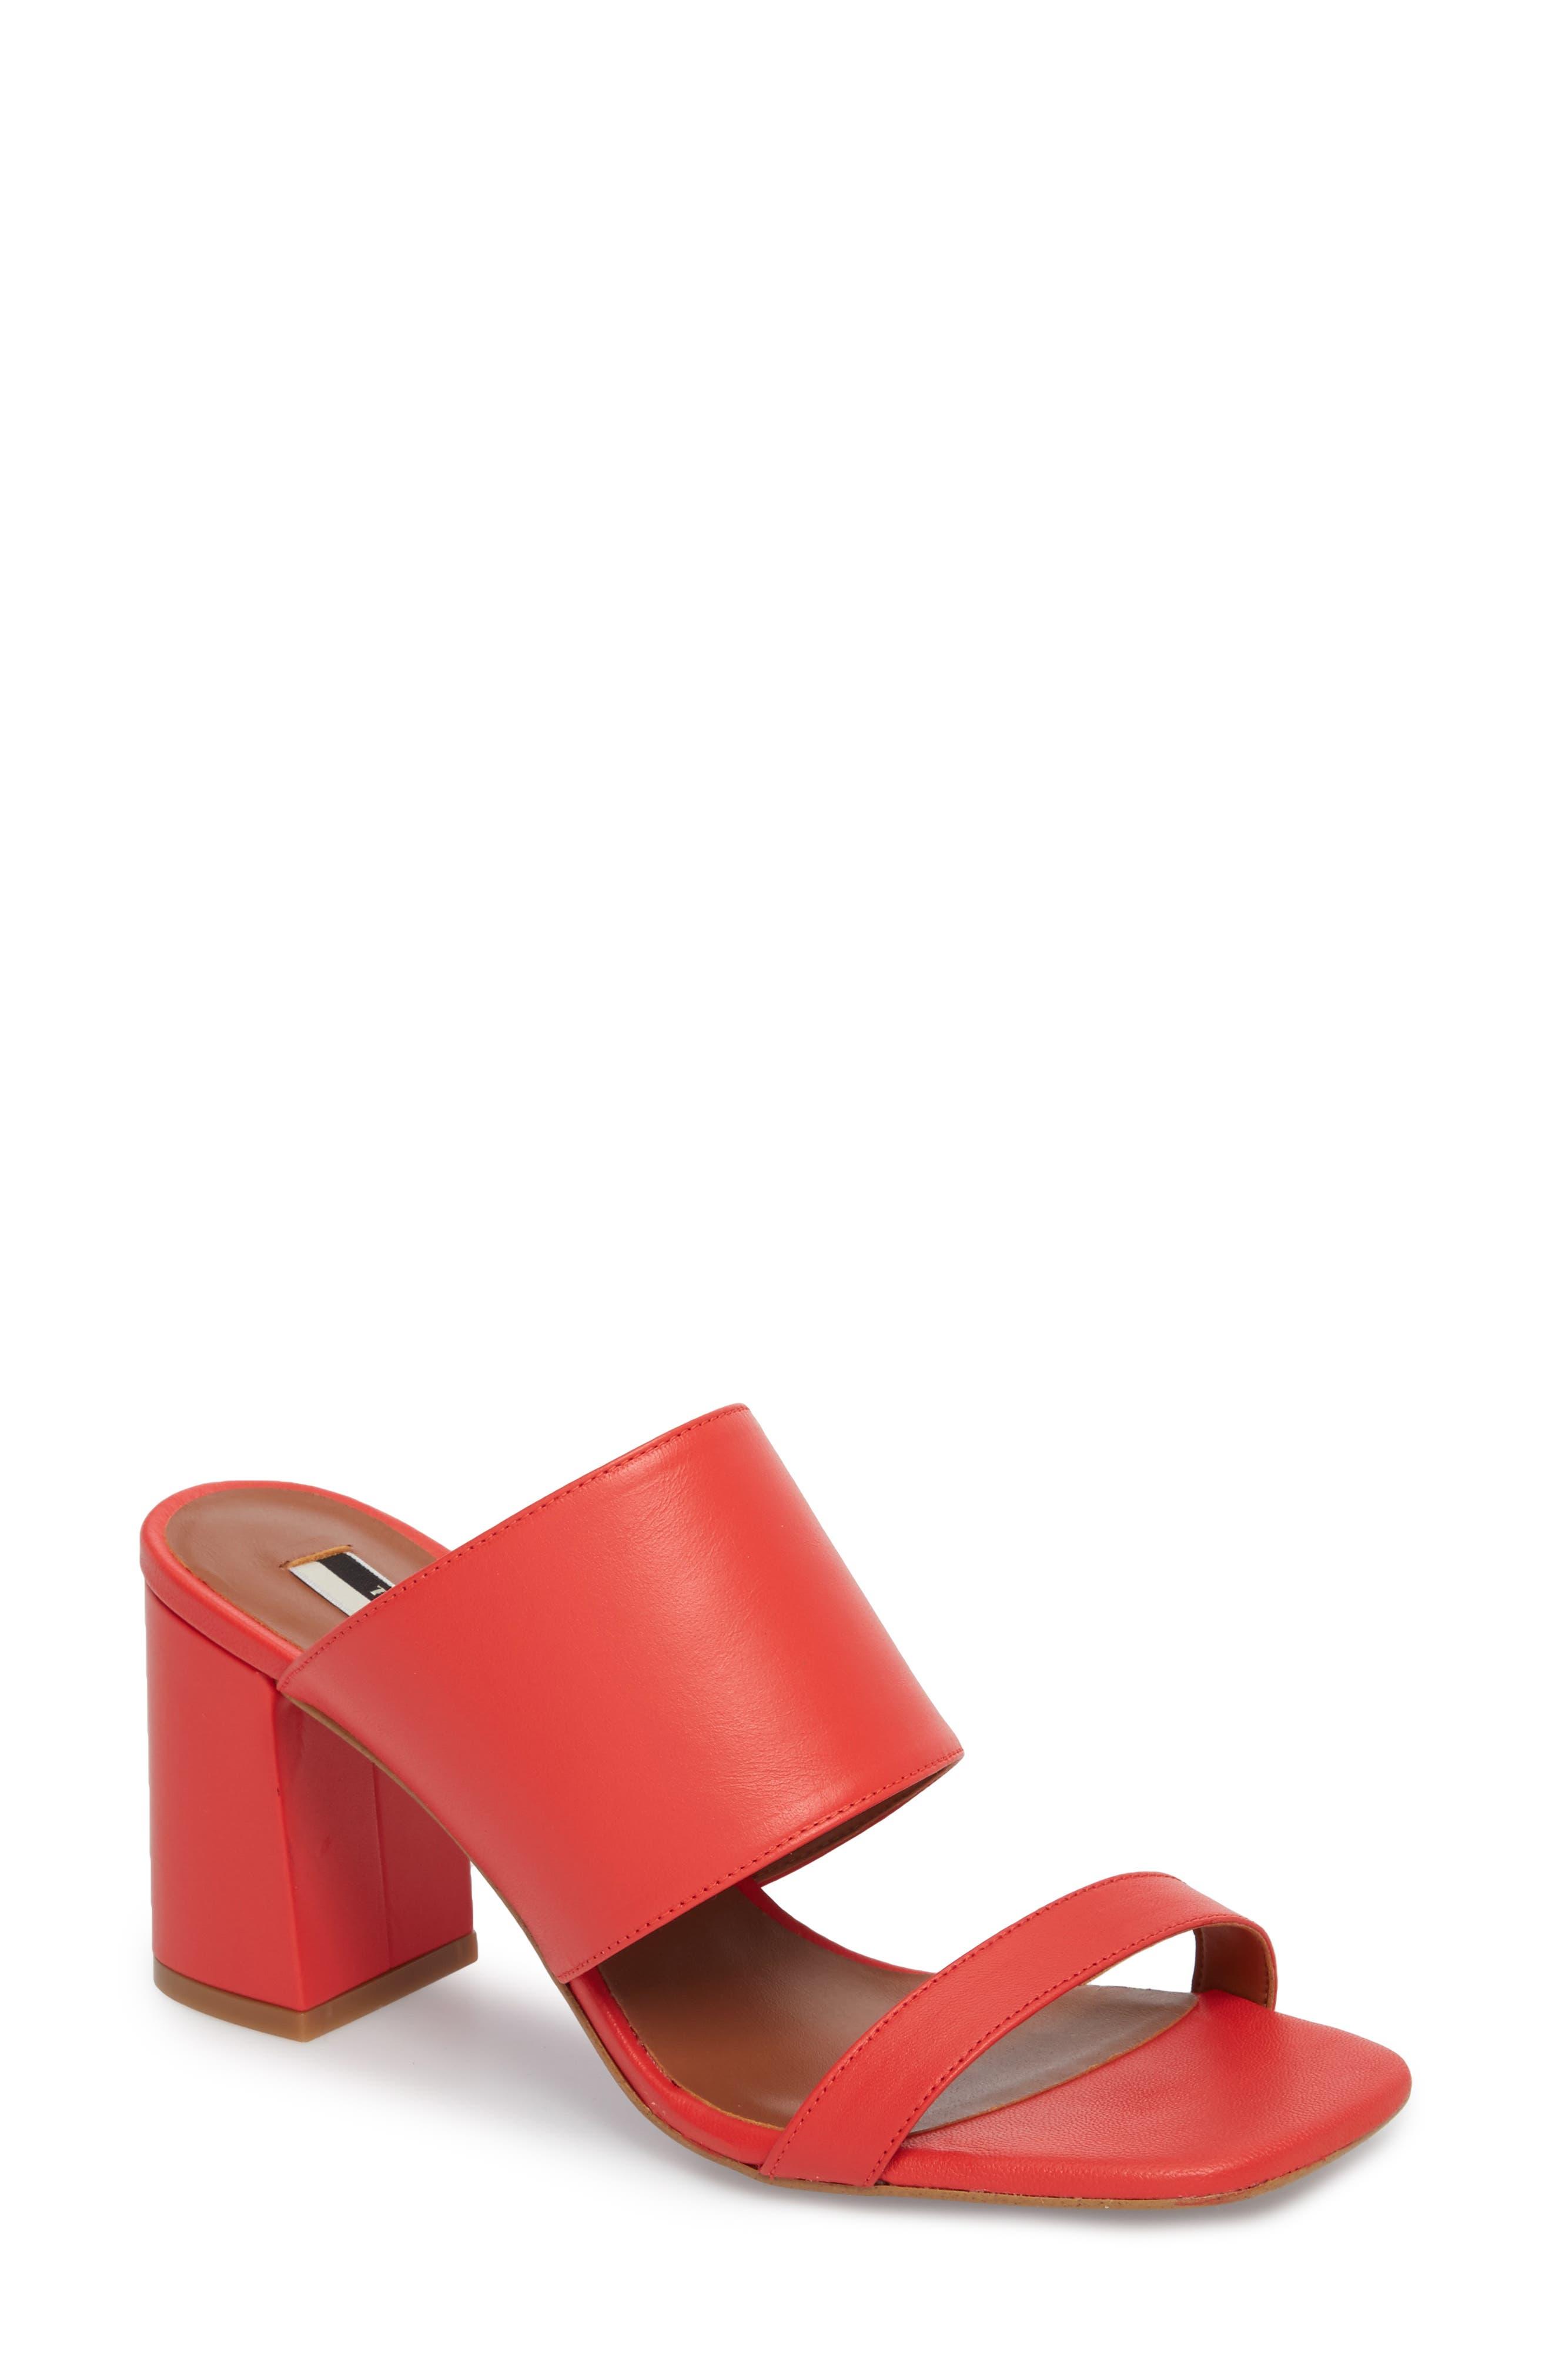 Nickle Mule Sandal,                             Main thumbnail 1, color,                             Red